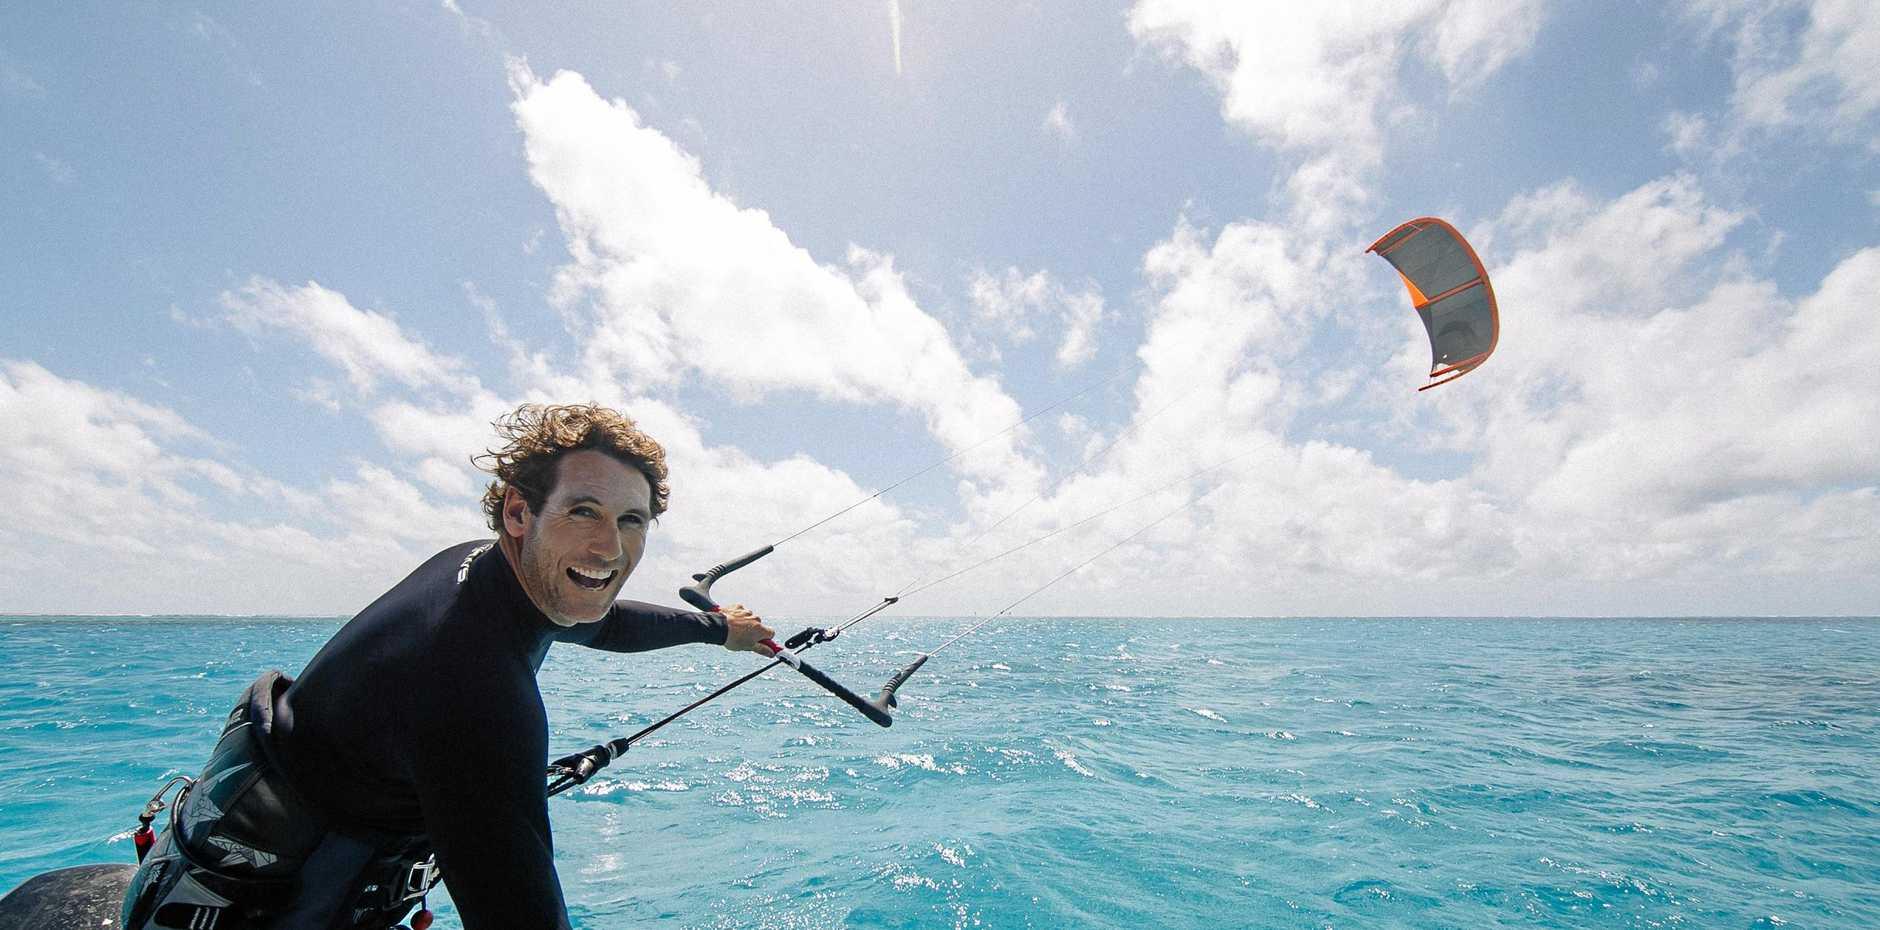 Australian kitesurf champion, Ben Wilson, chasing secret waves on the Great Barrier Reef for the first time.